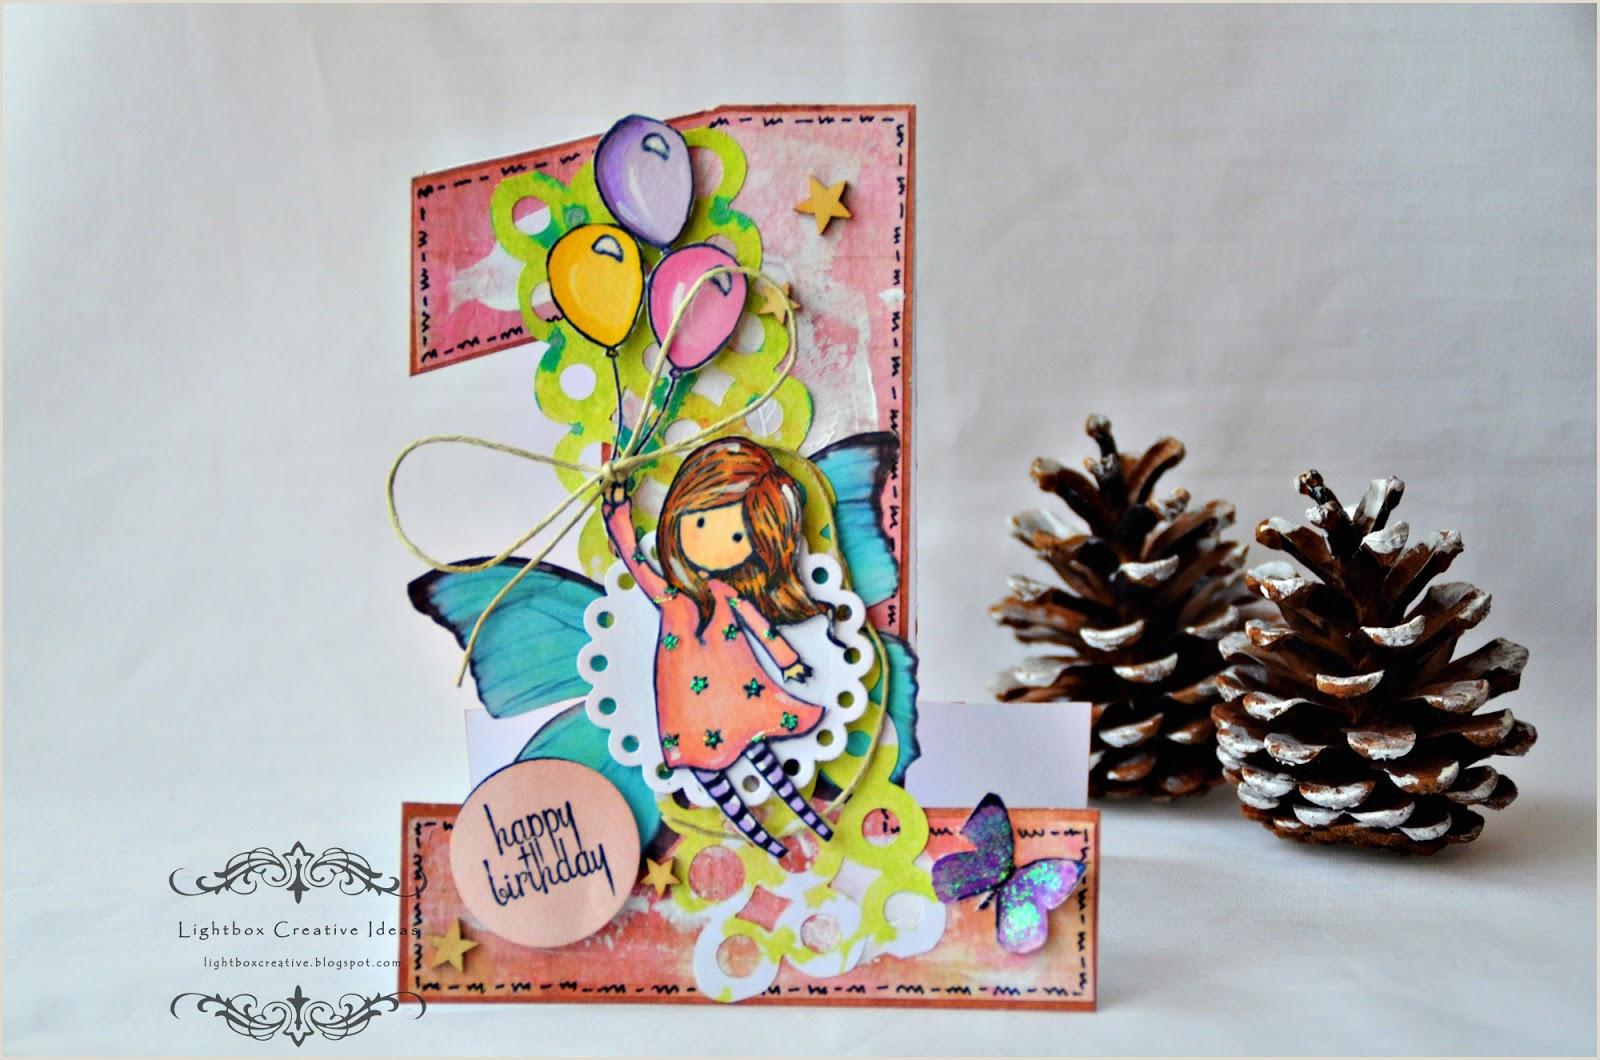 Creative Card Designs Birthday Card Creative Ideas Card Design Template